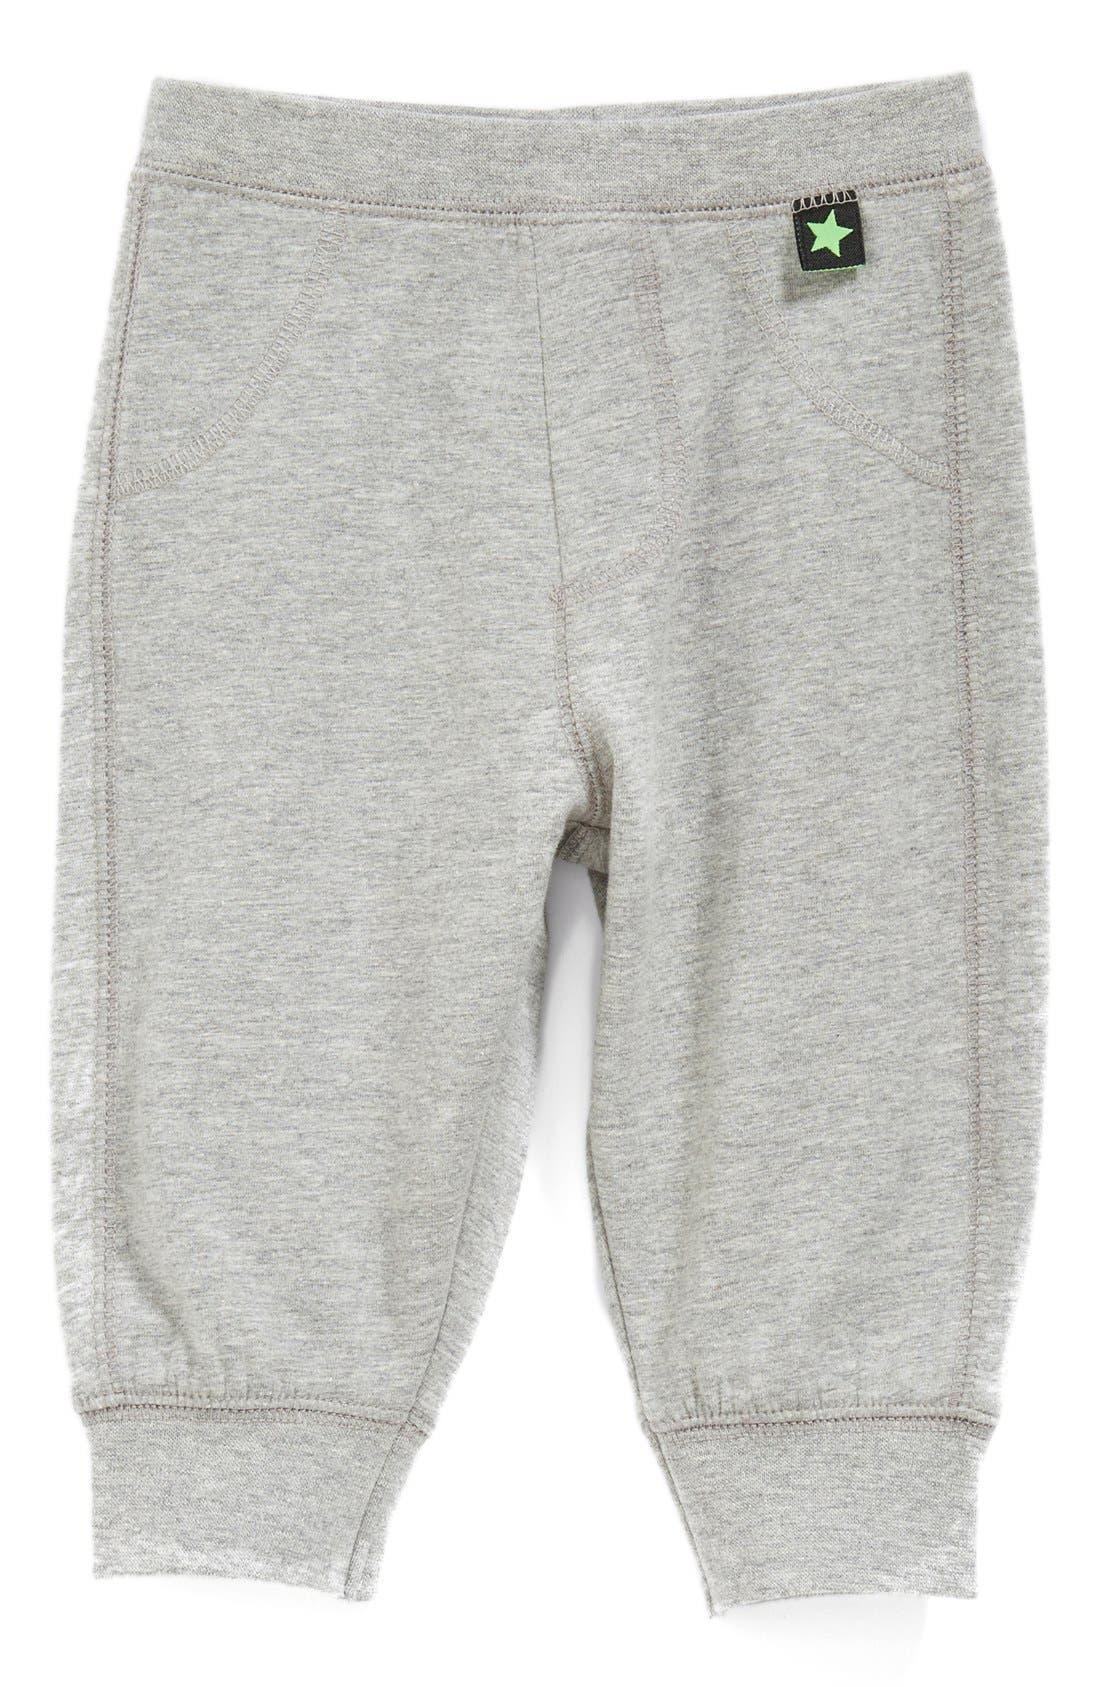 Main Image - molo 'Scott' Sweatpants (Baby Boys)